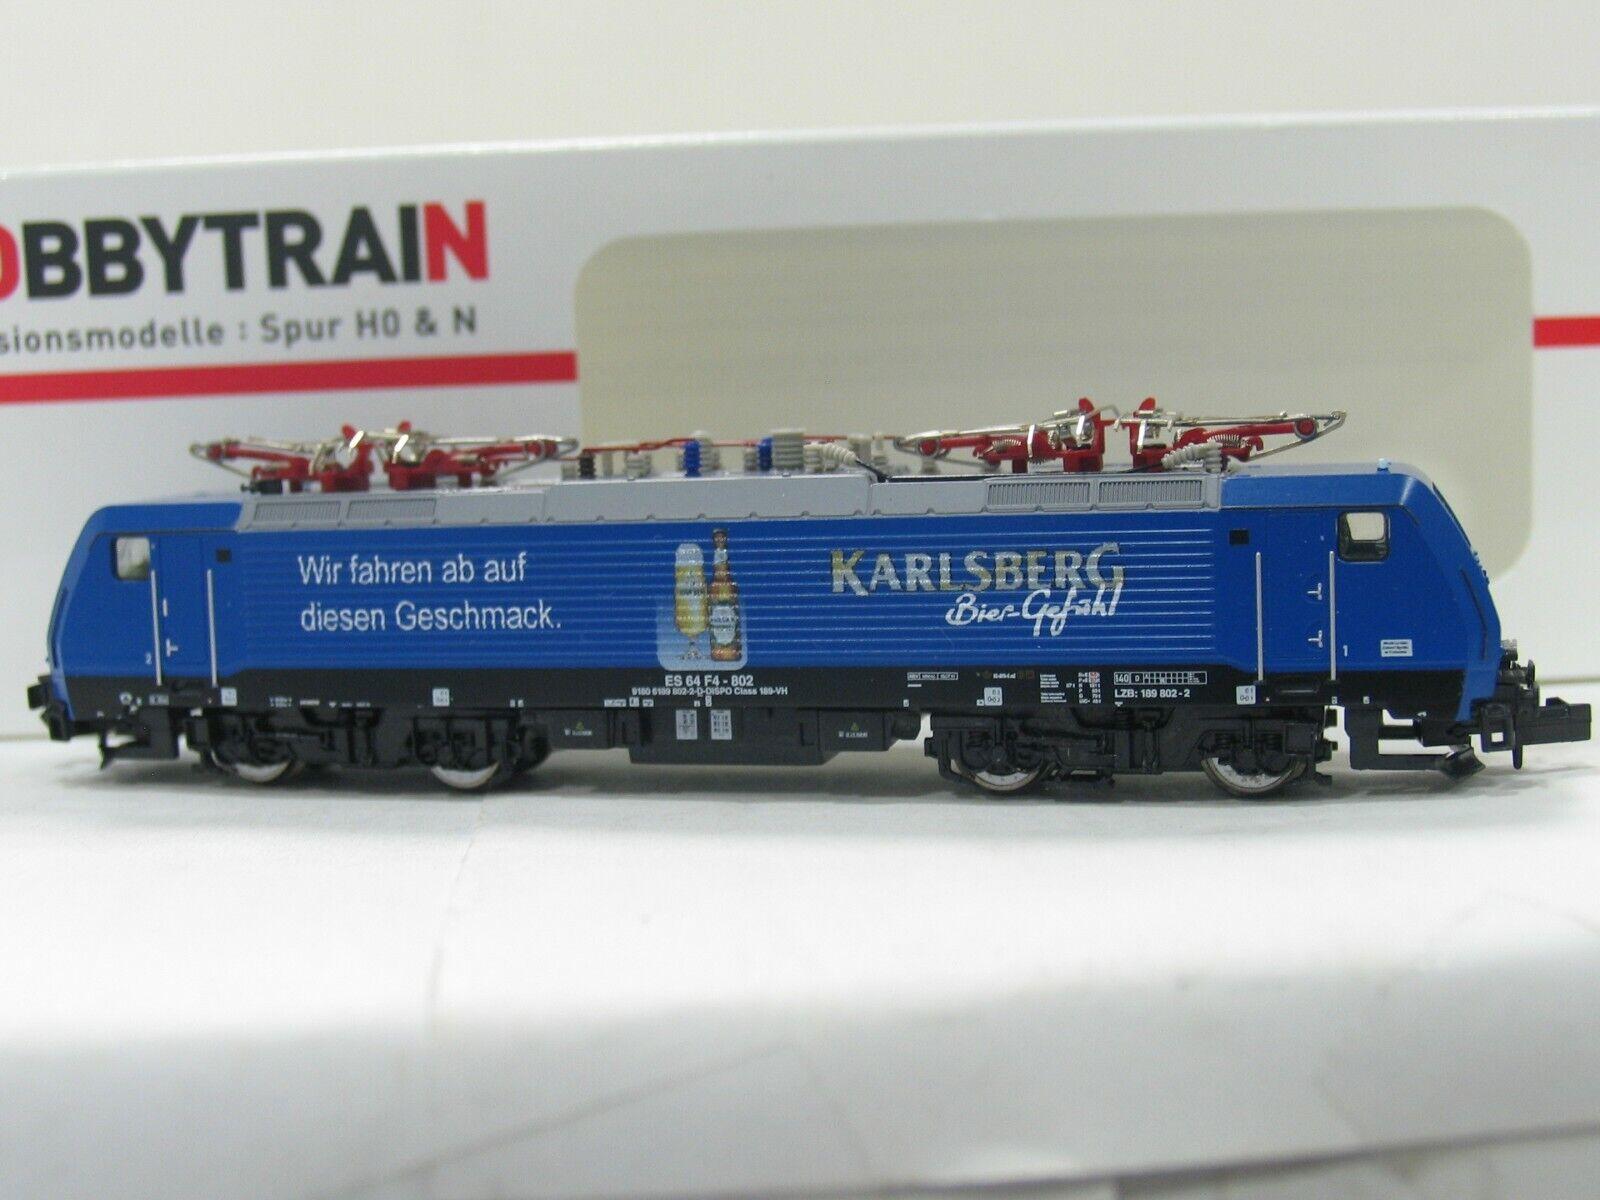 Hobbytrain h2918.1 e-Lok br 189 Karl montaña nh184